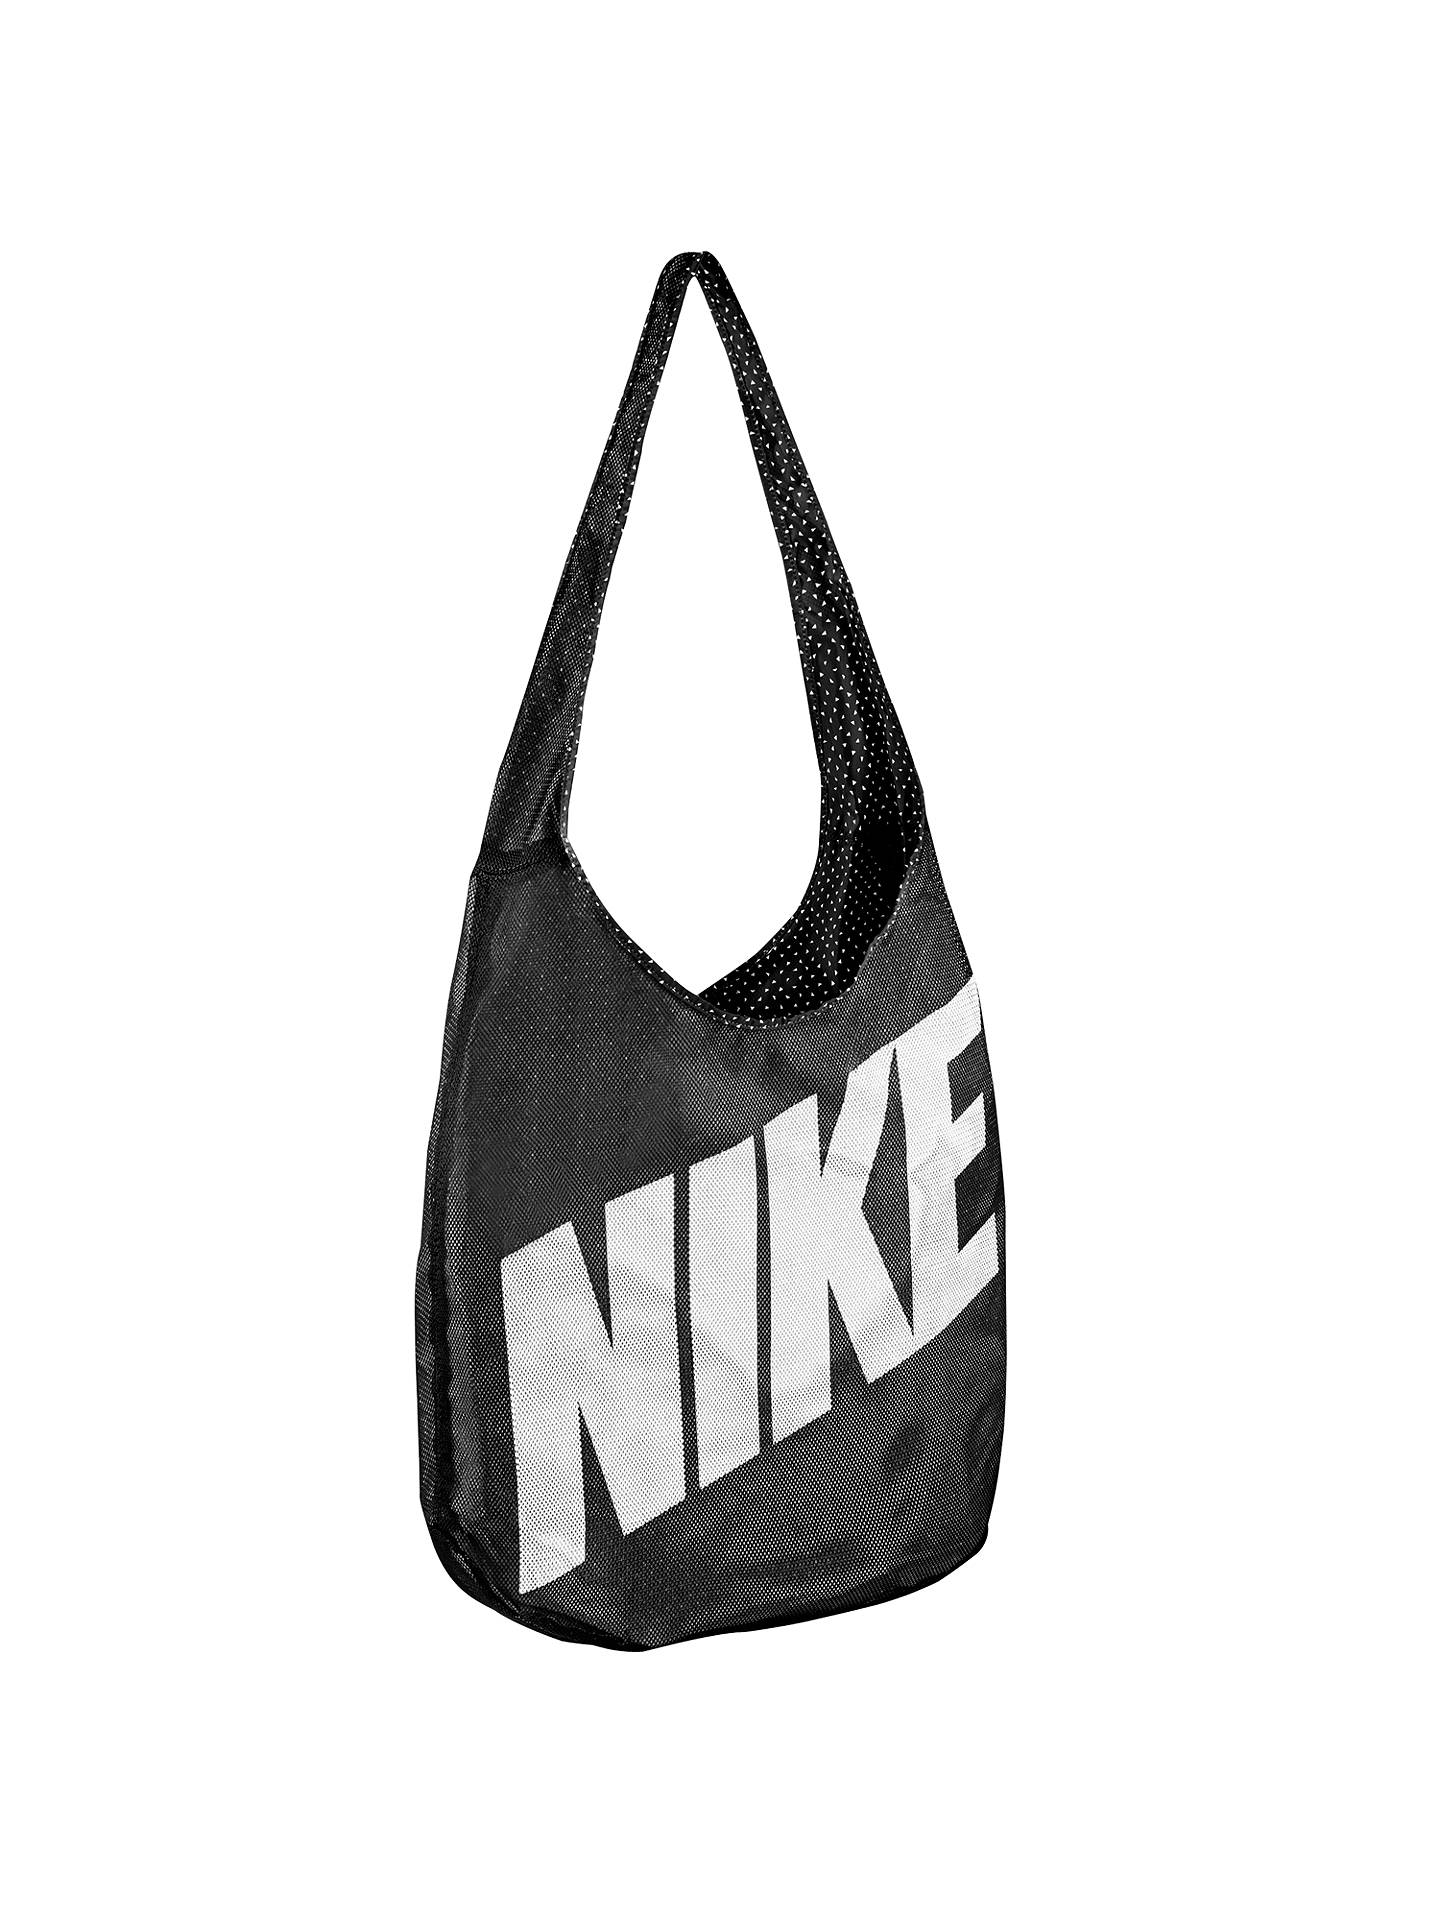 BuyNike Graphic Reversible Tote Bag f7ebe53ed8615